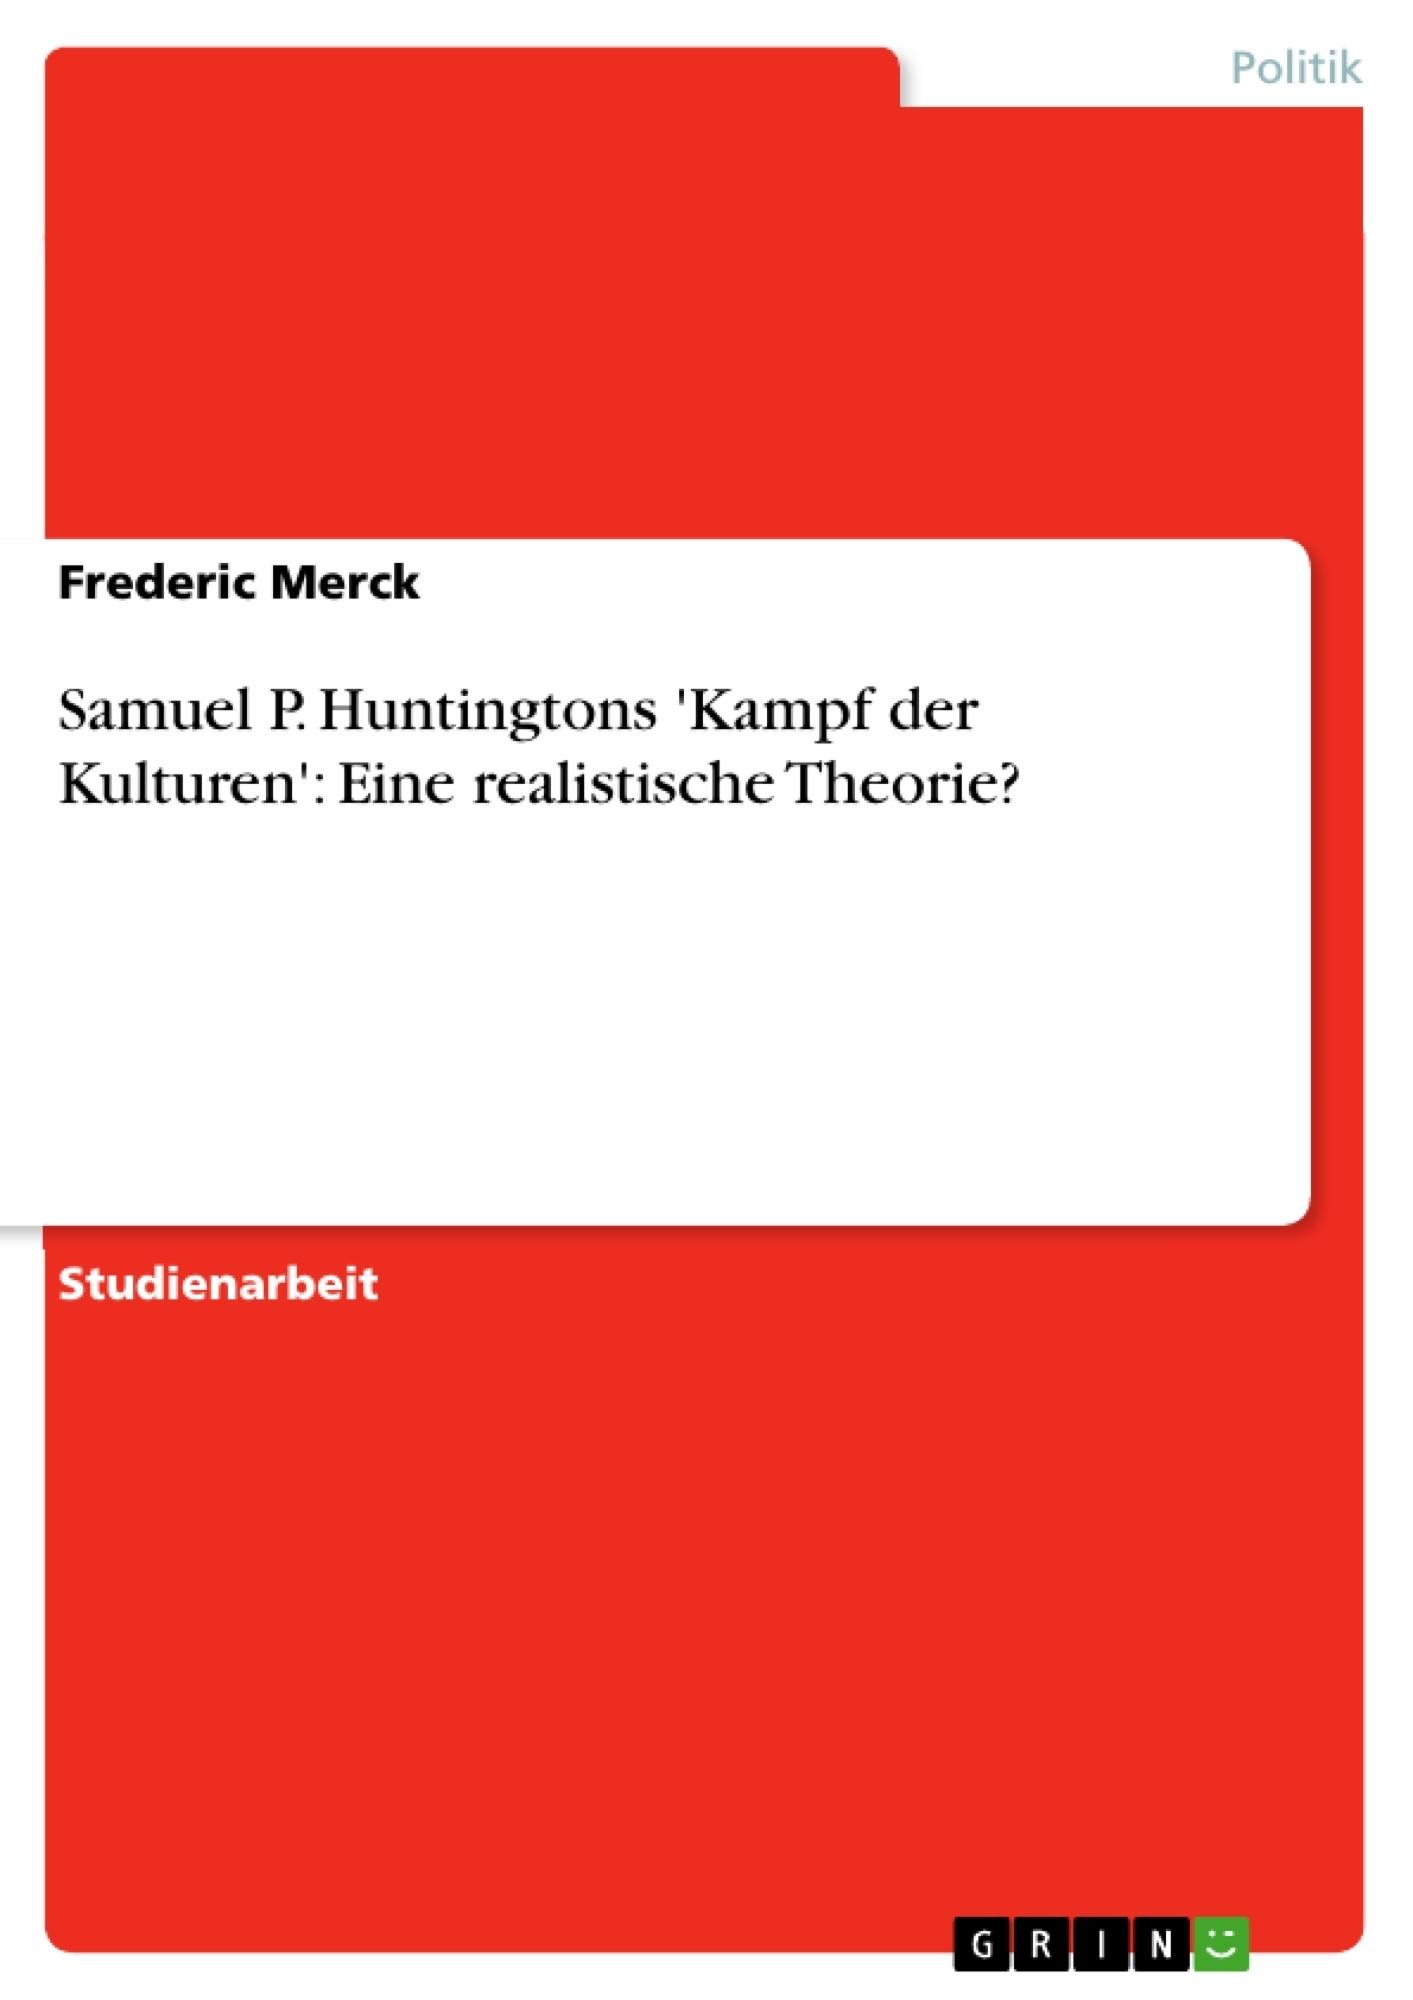 Titel: Samuel P. Huntingtons 'Kampf der Kulturen':  Eine realistische Theorie?